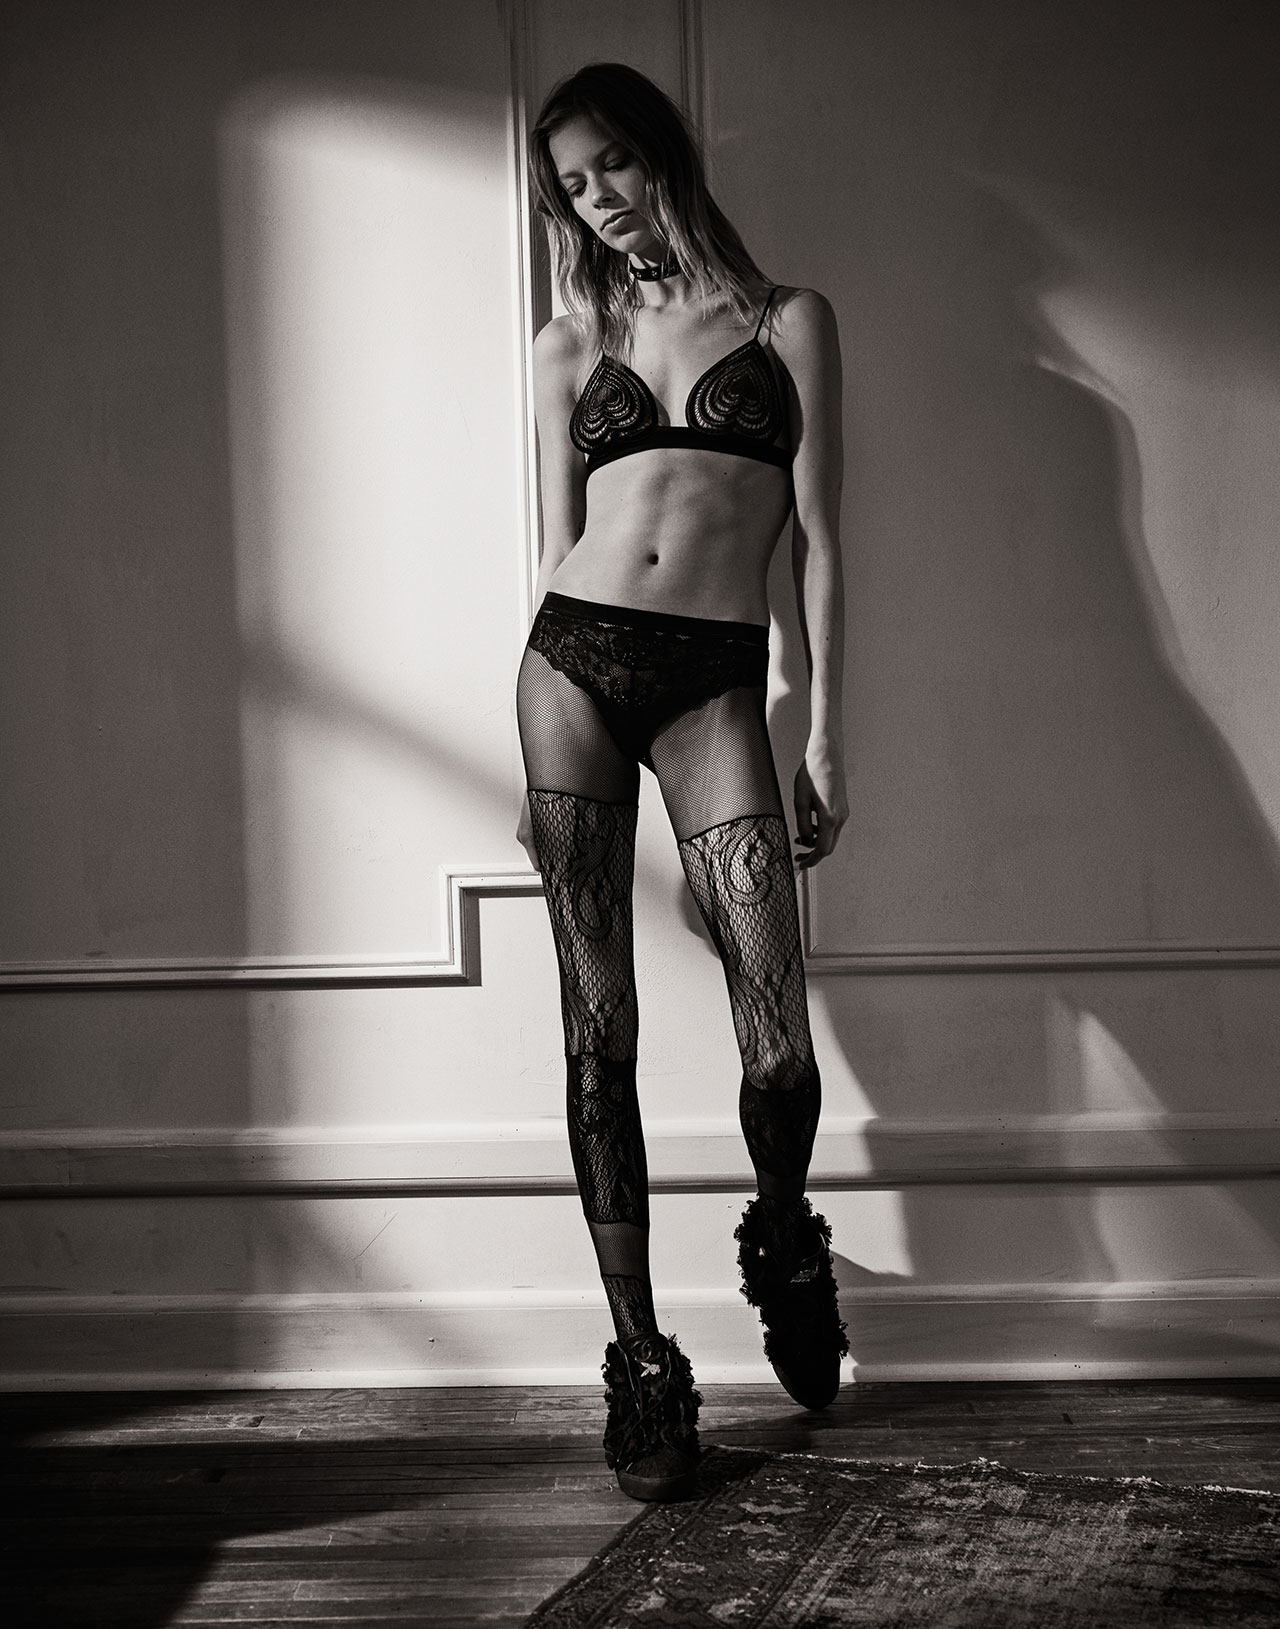 Lexi Boling nudes (12 photo), Sexy, Paparazzi, Boobs, legs 2017